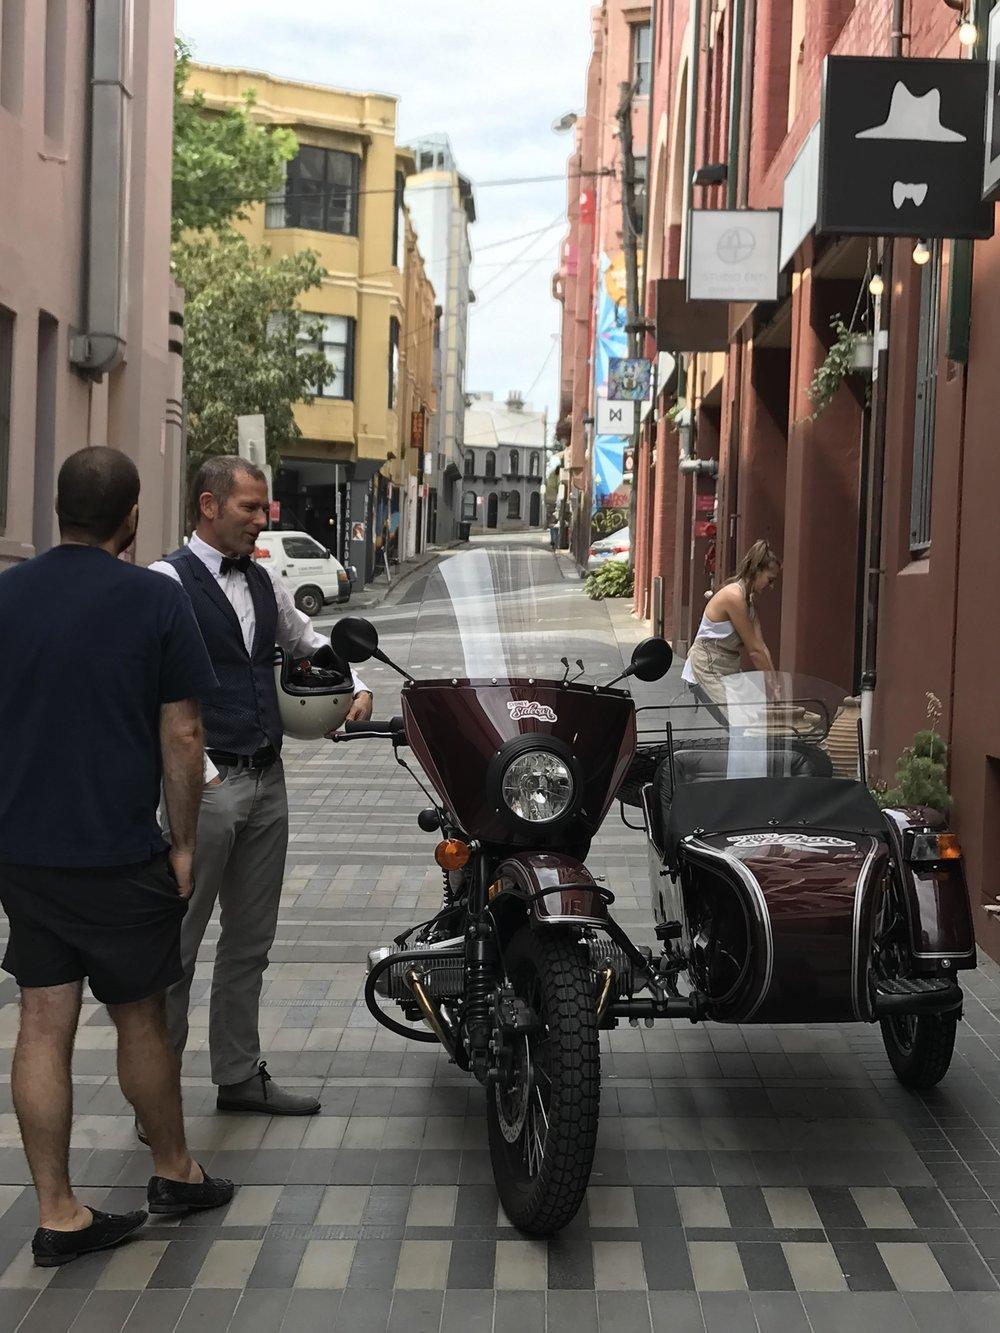 laneway-custom-tours-sydney-sidecar-experience.jpg